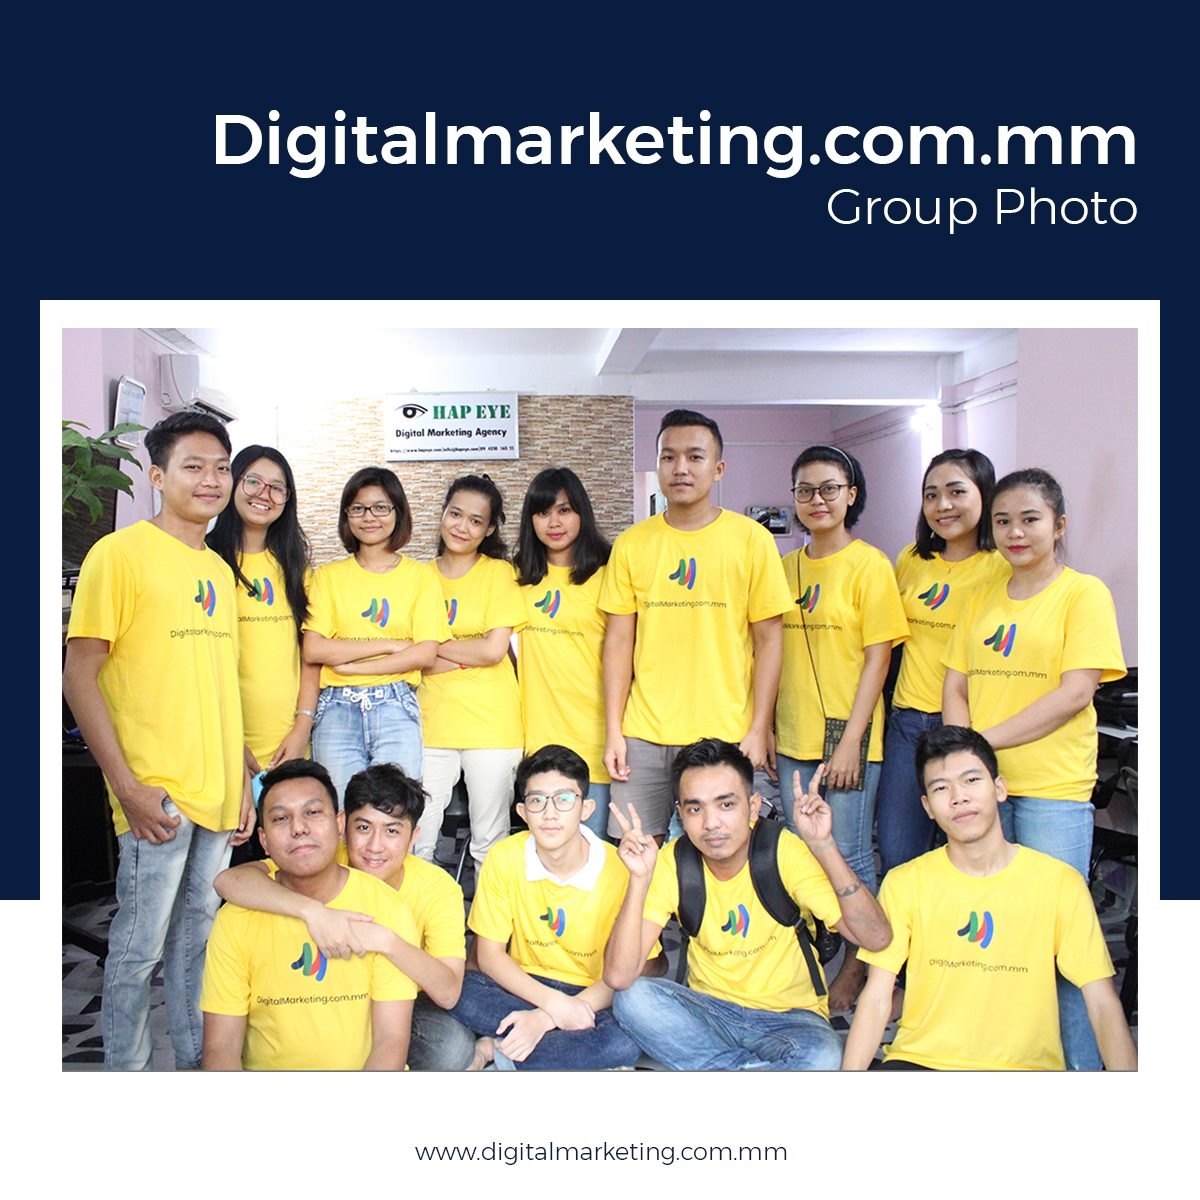 DigitalMarketing.com.mm